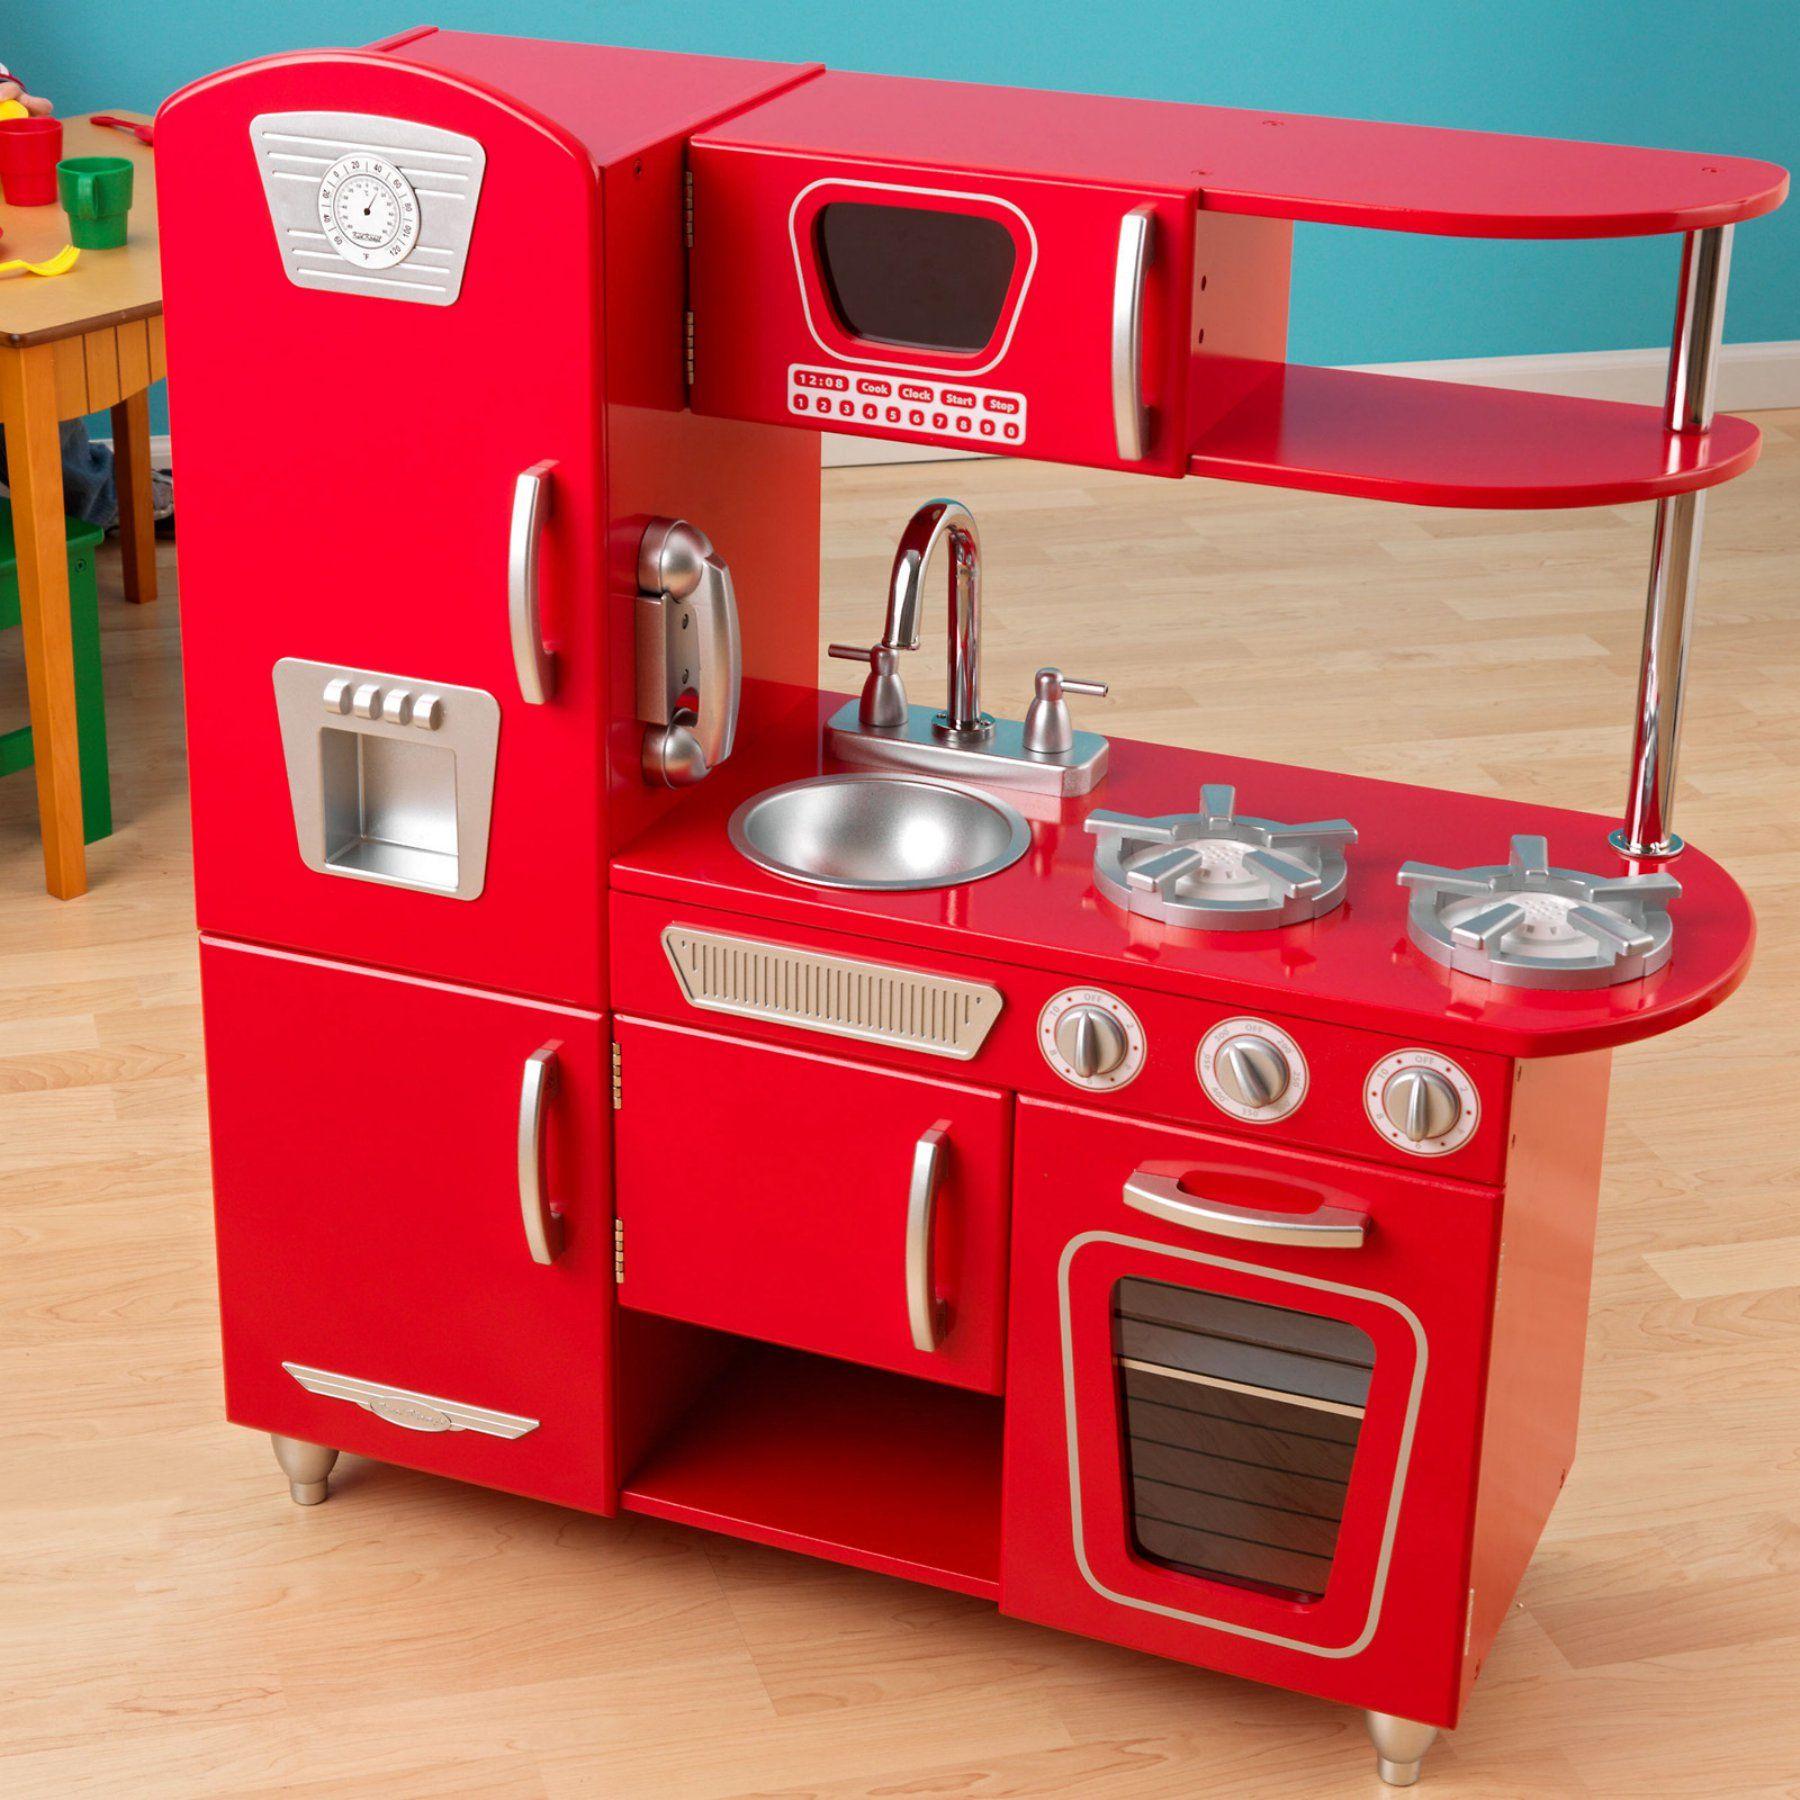 Kidkraft Red Vintage Play Kitchen 53173